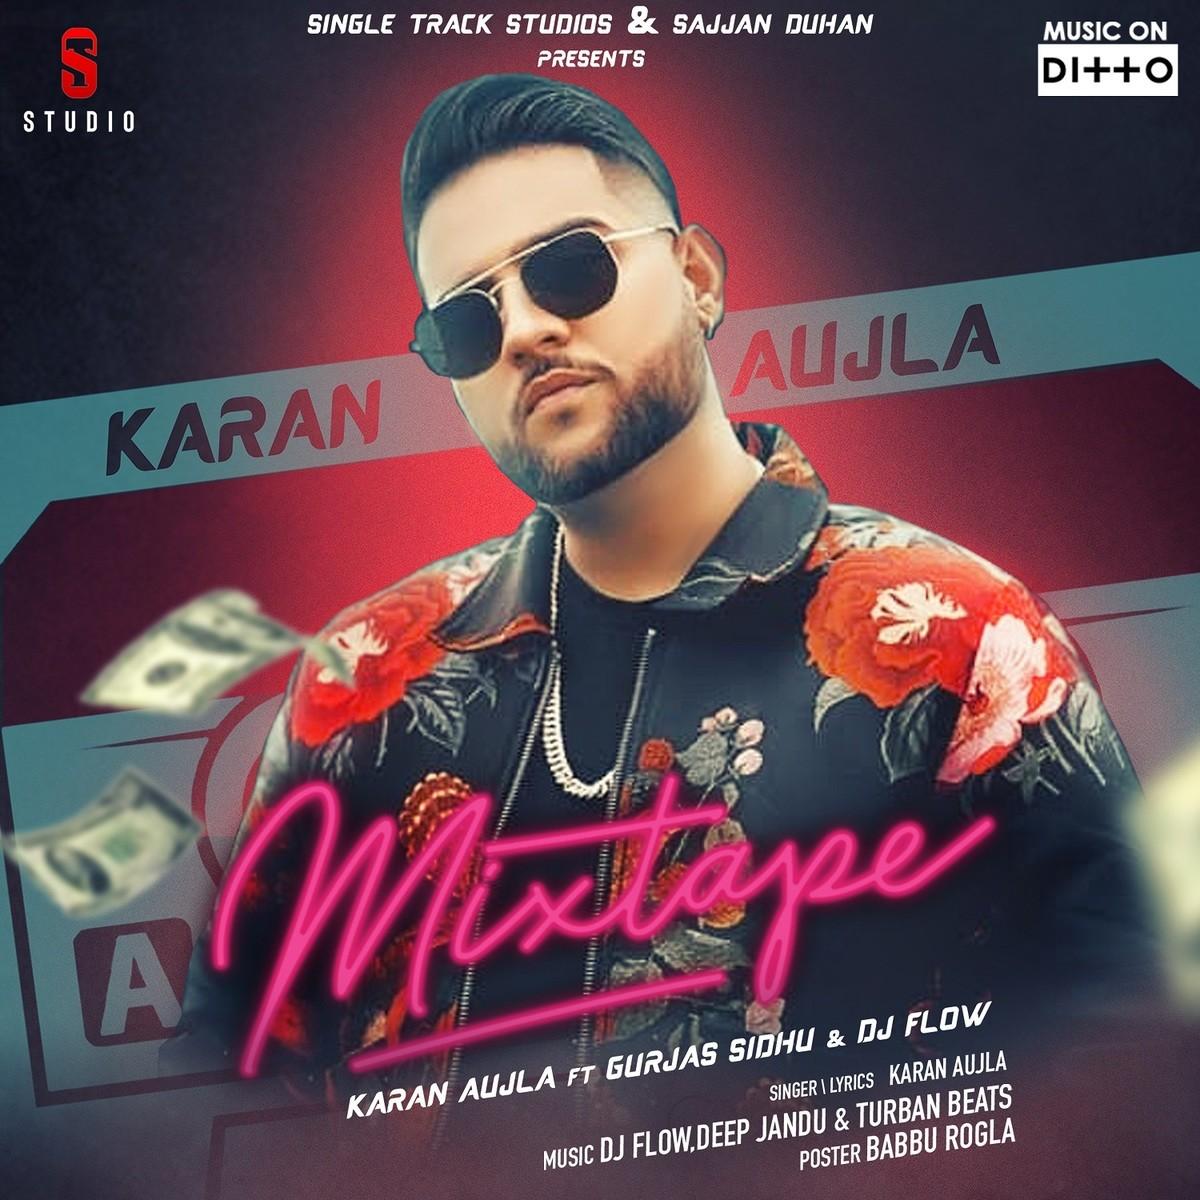 Karan Aujla S Mixtape Lyrics In Punjabi Karan Aujla S Mixtape Karan Aujla S Mixtape Song Lyrics In English Free Online On Gaana Com